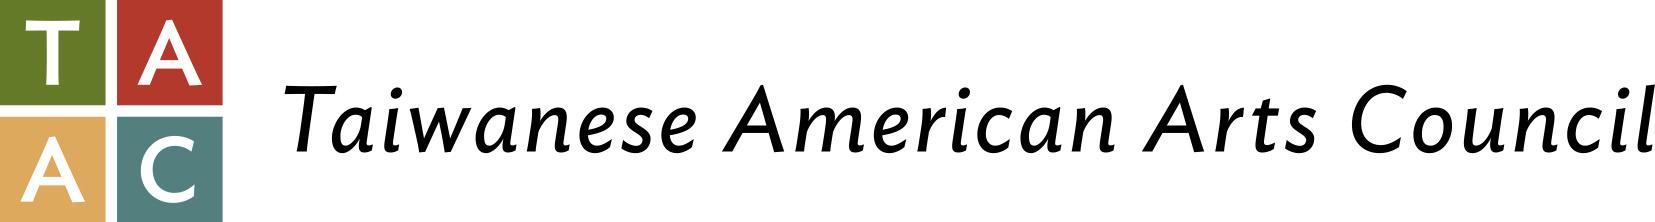 TAAC_Logo_02.jpg